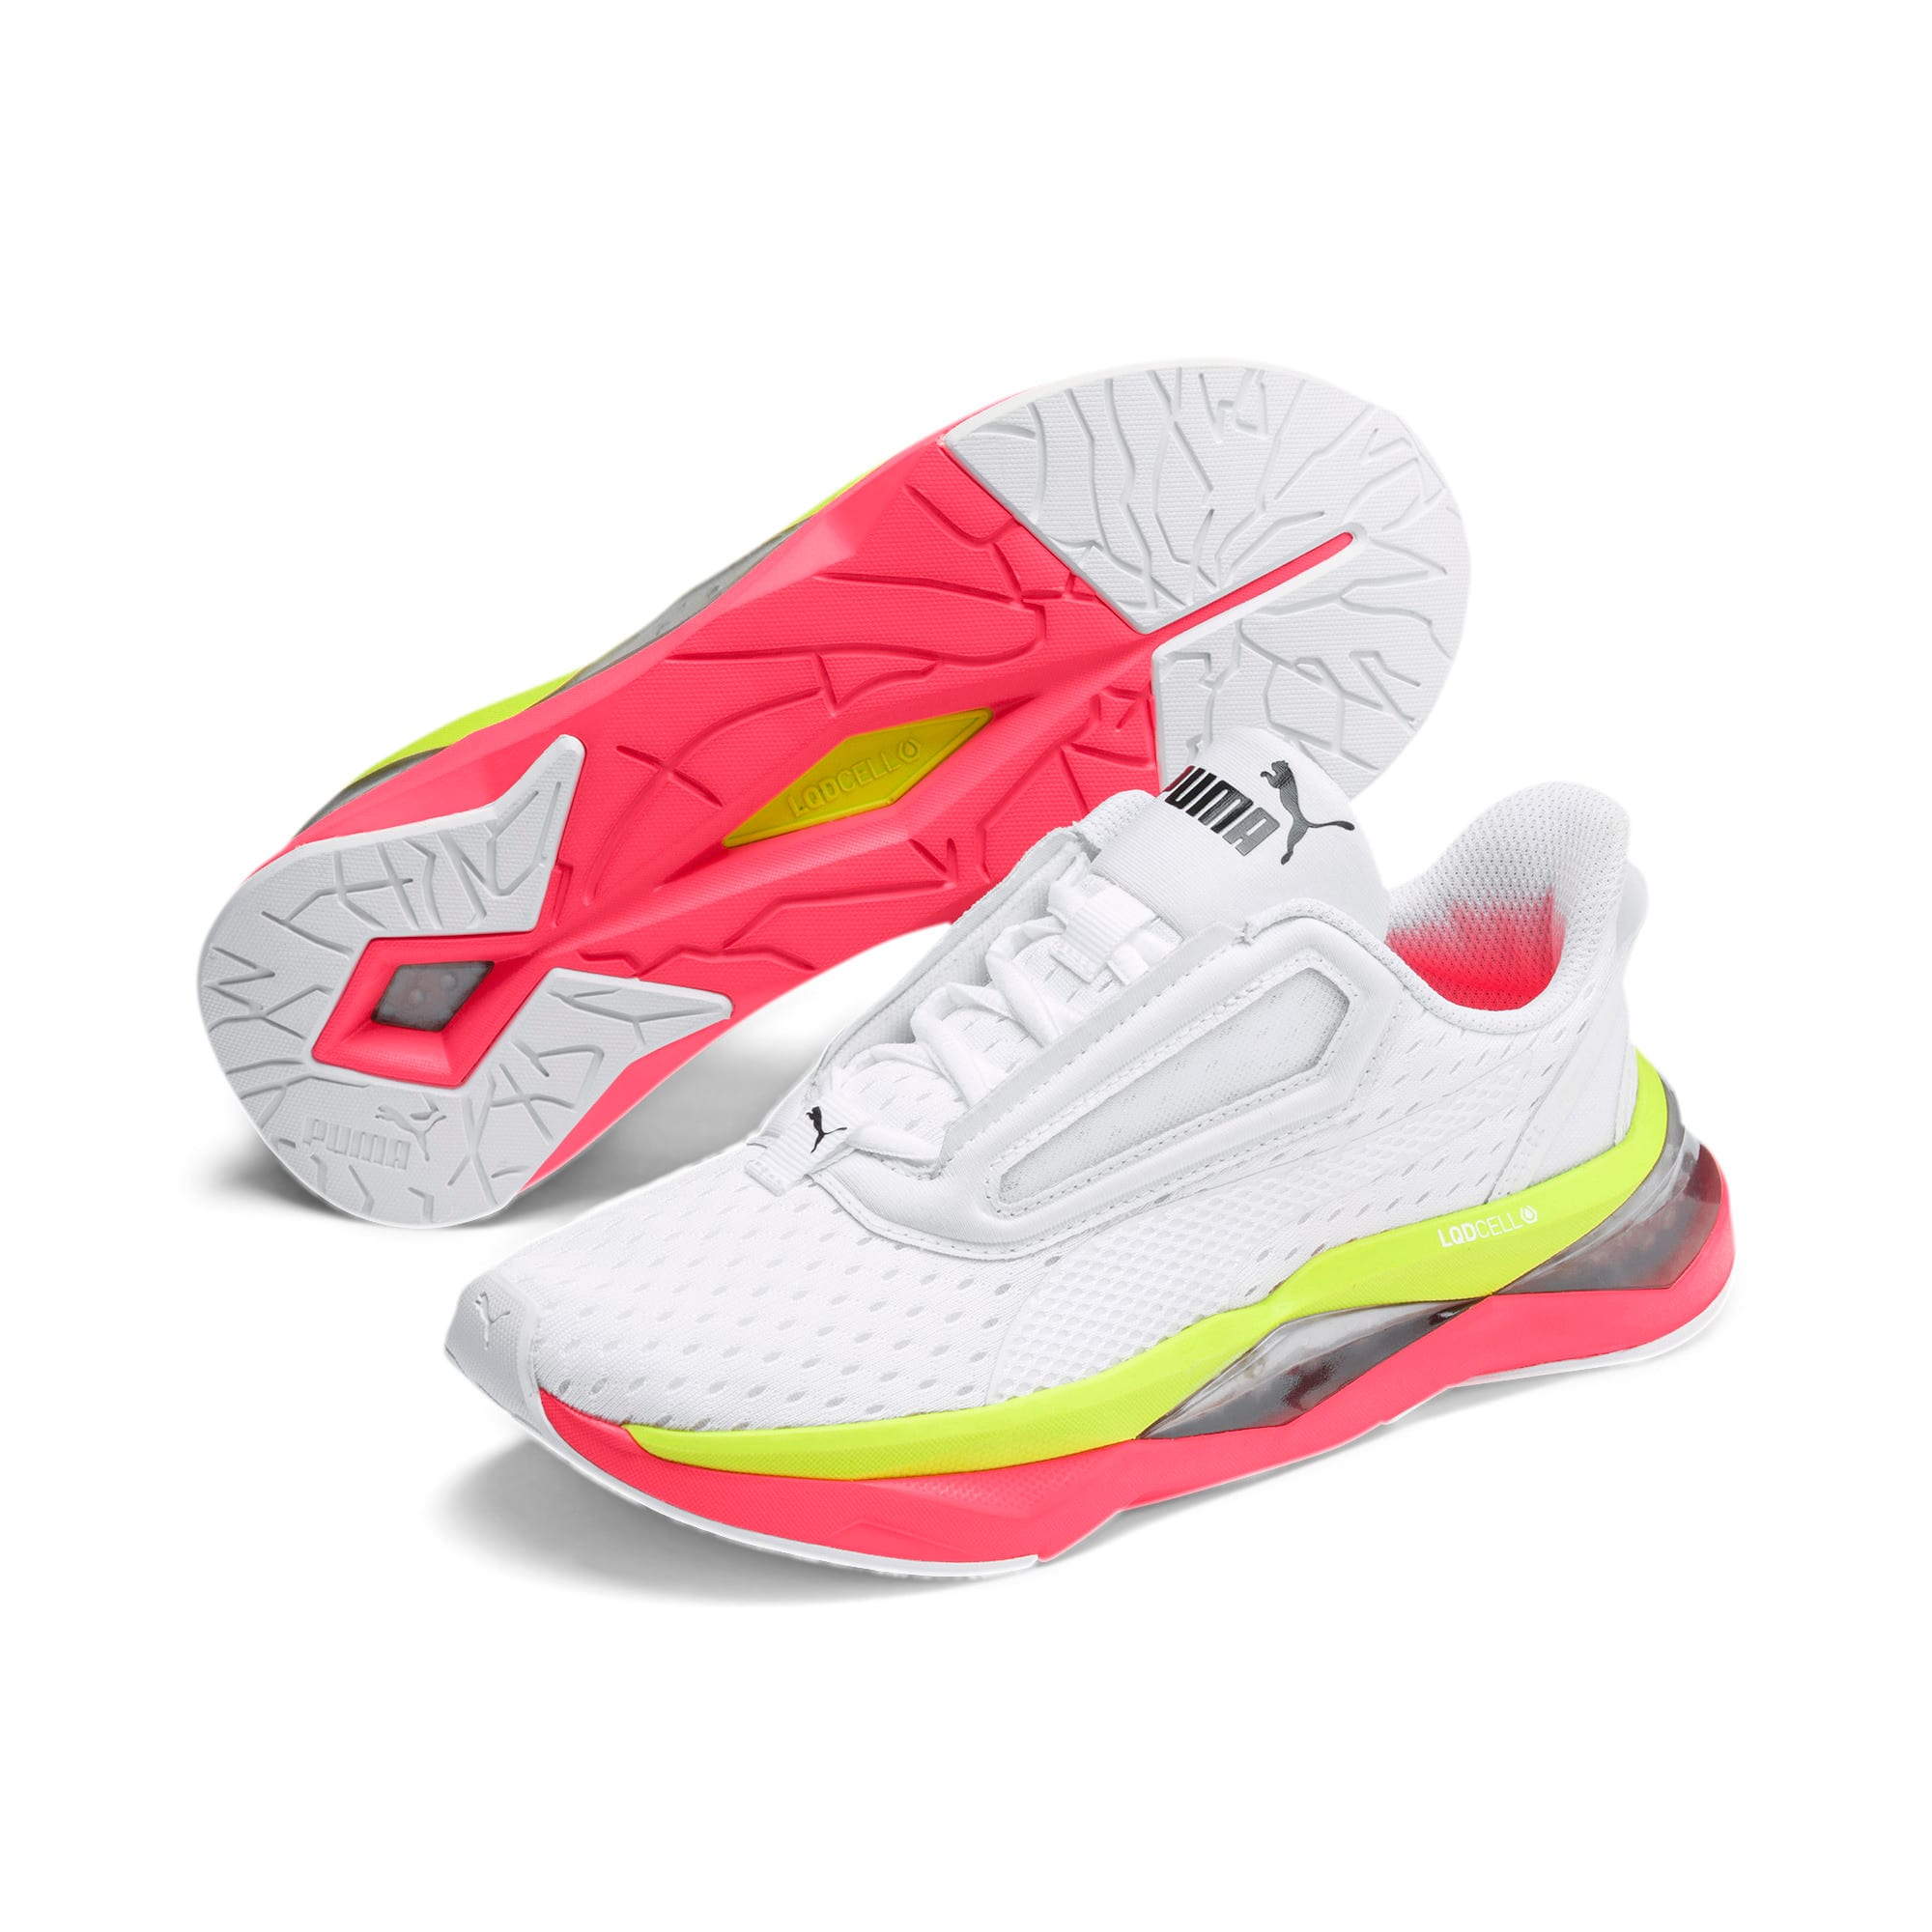 Thumbnail 3 of LQDCELL Shatter XT Women's Training Shoes, Puma White-Pink Alert, medium